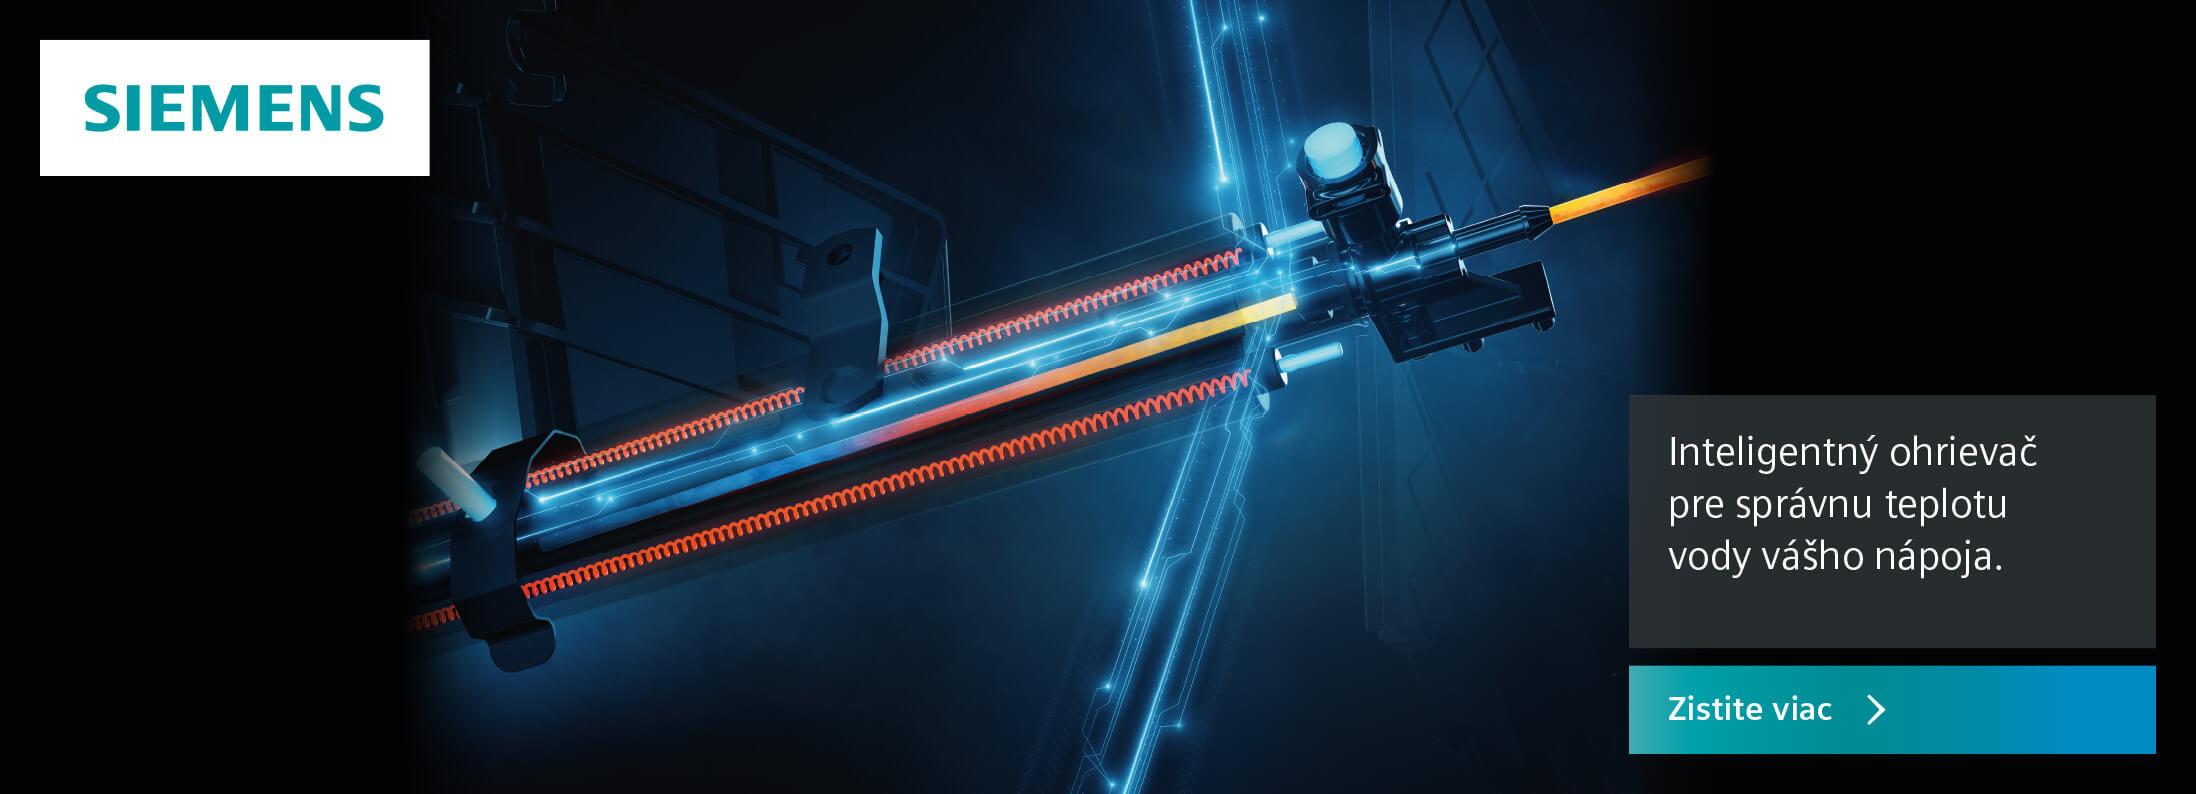 Siemens - Inteligentný ohrievač